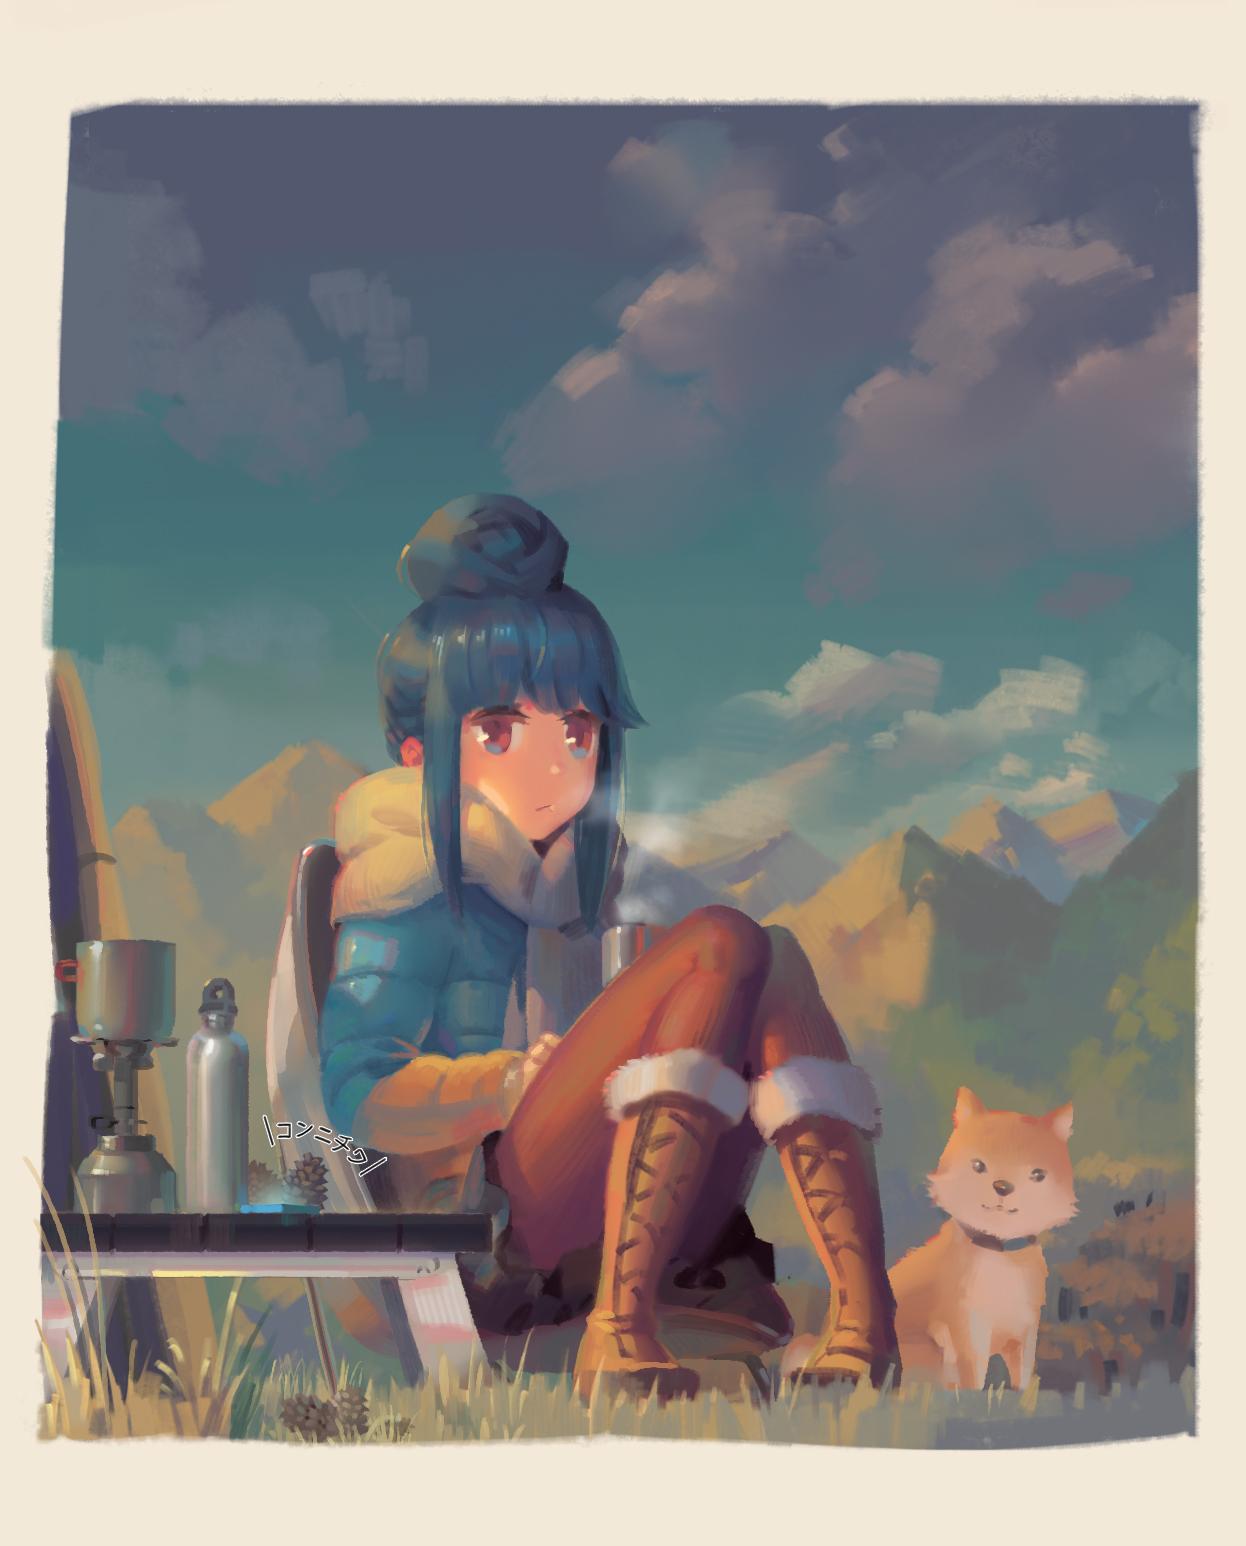 Wallpaper Yuru Camp Anime Girls Rin Shima 1246x1546 Carlosg97 1399683 Hd Wallpapers Wallhere